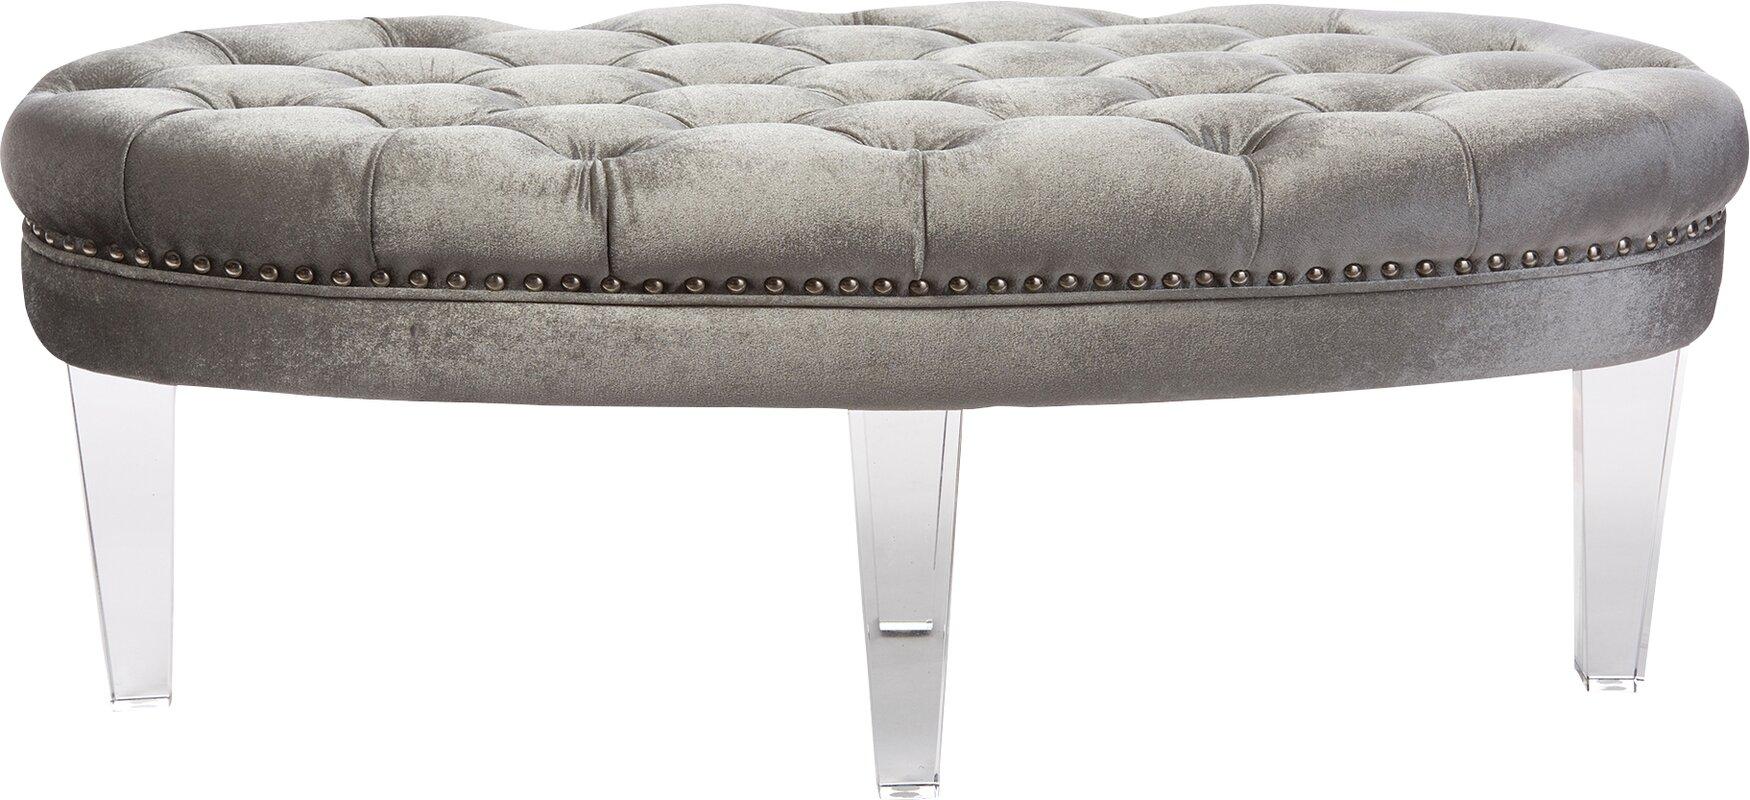 wholesale interiors baxton studio oval microsuede fabric  - defaultname